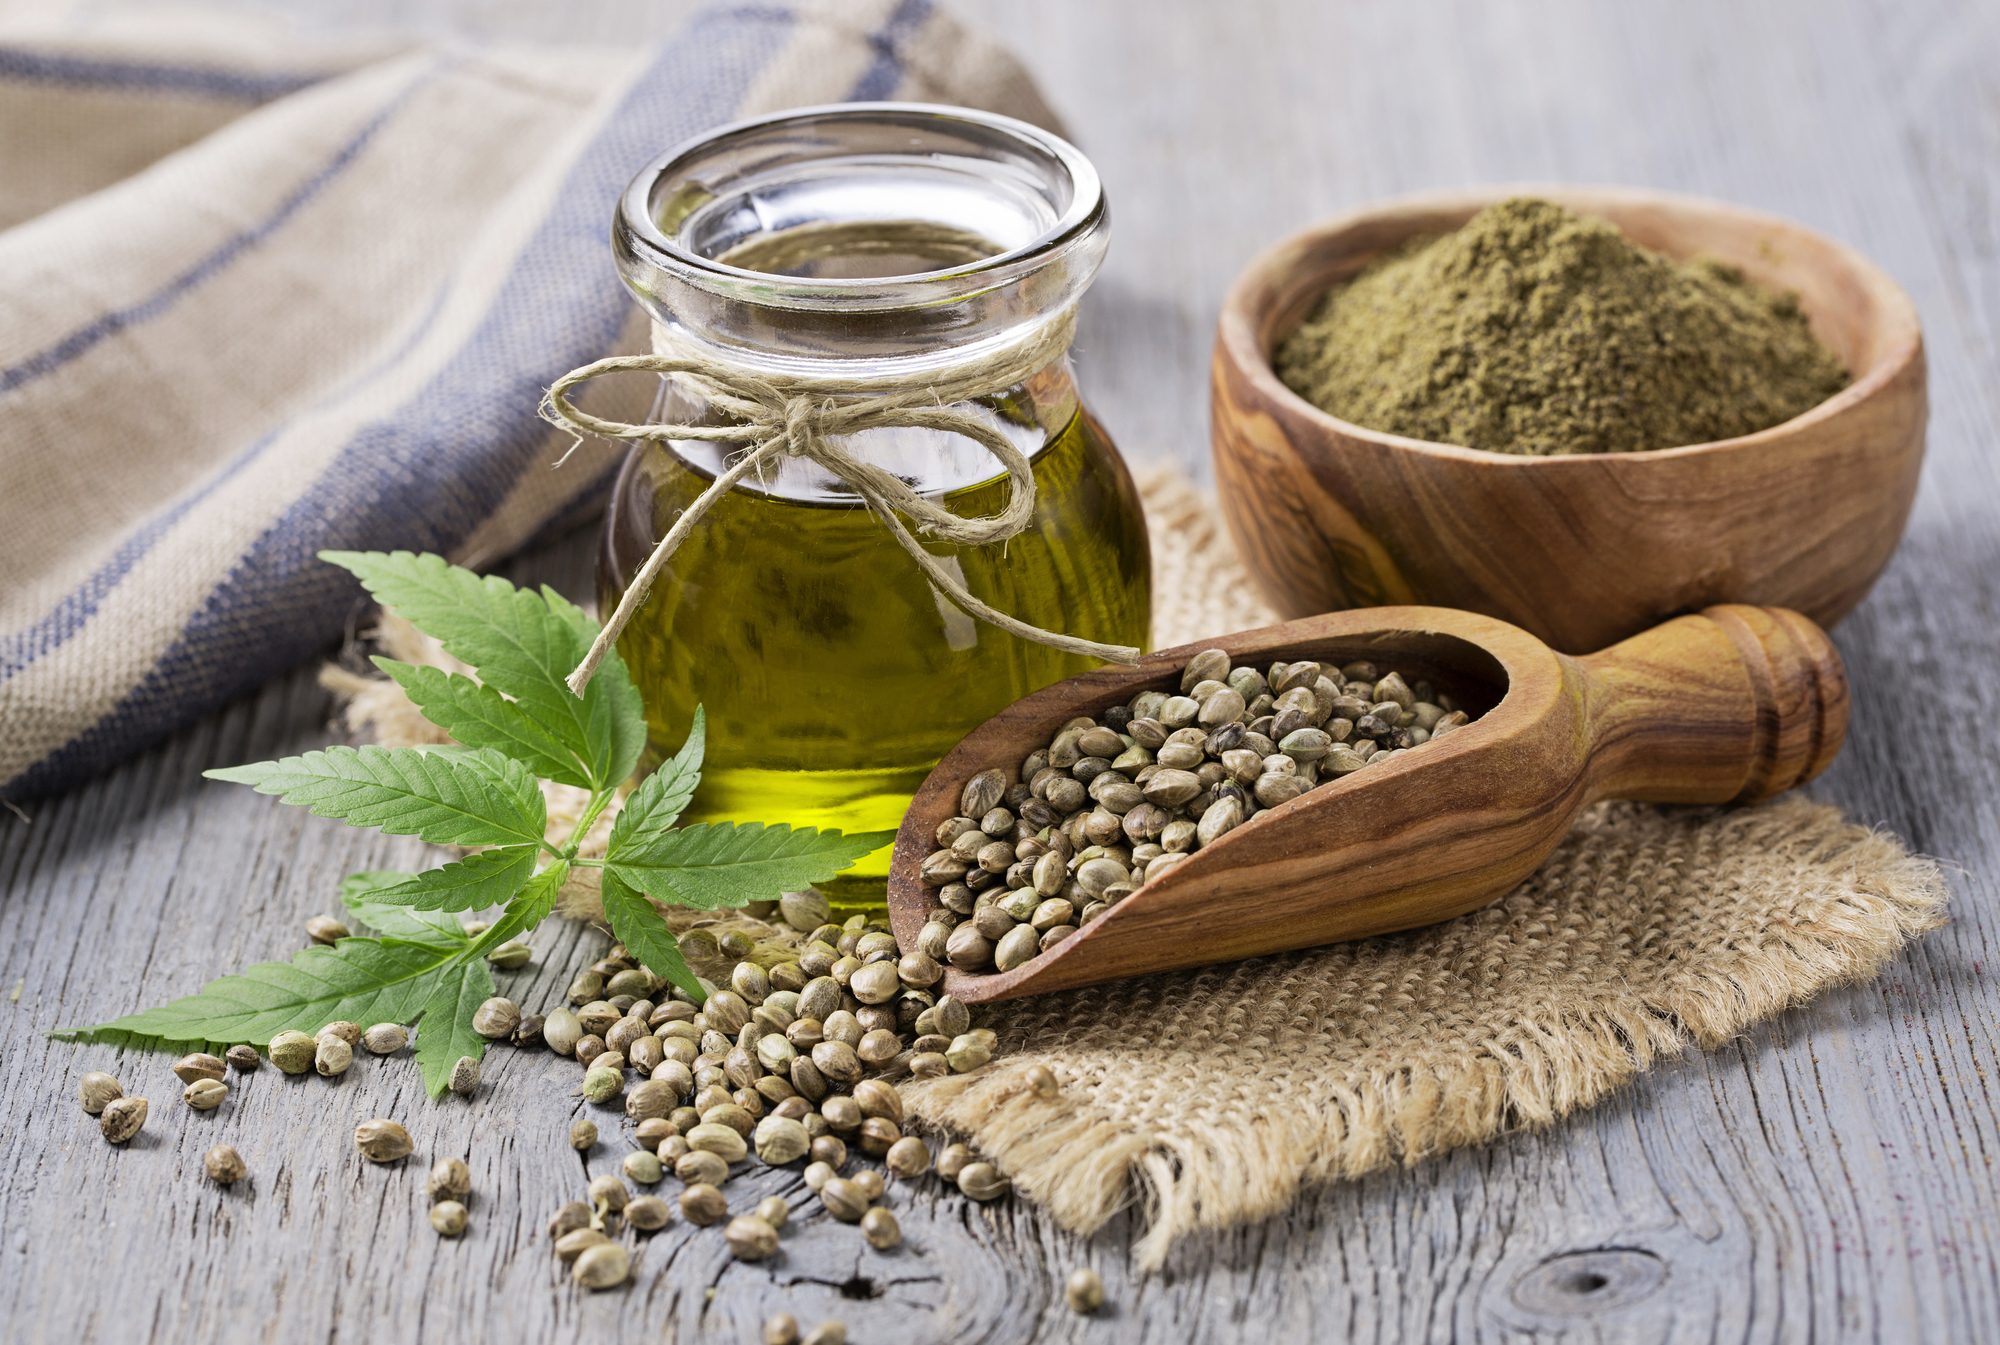 #hemp cannabis marijuana cbd thc weed oil hemp seed extract